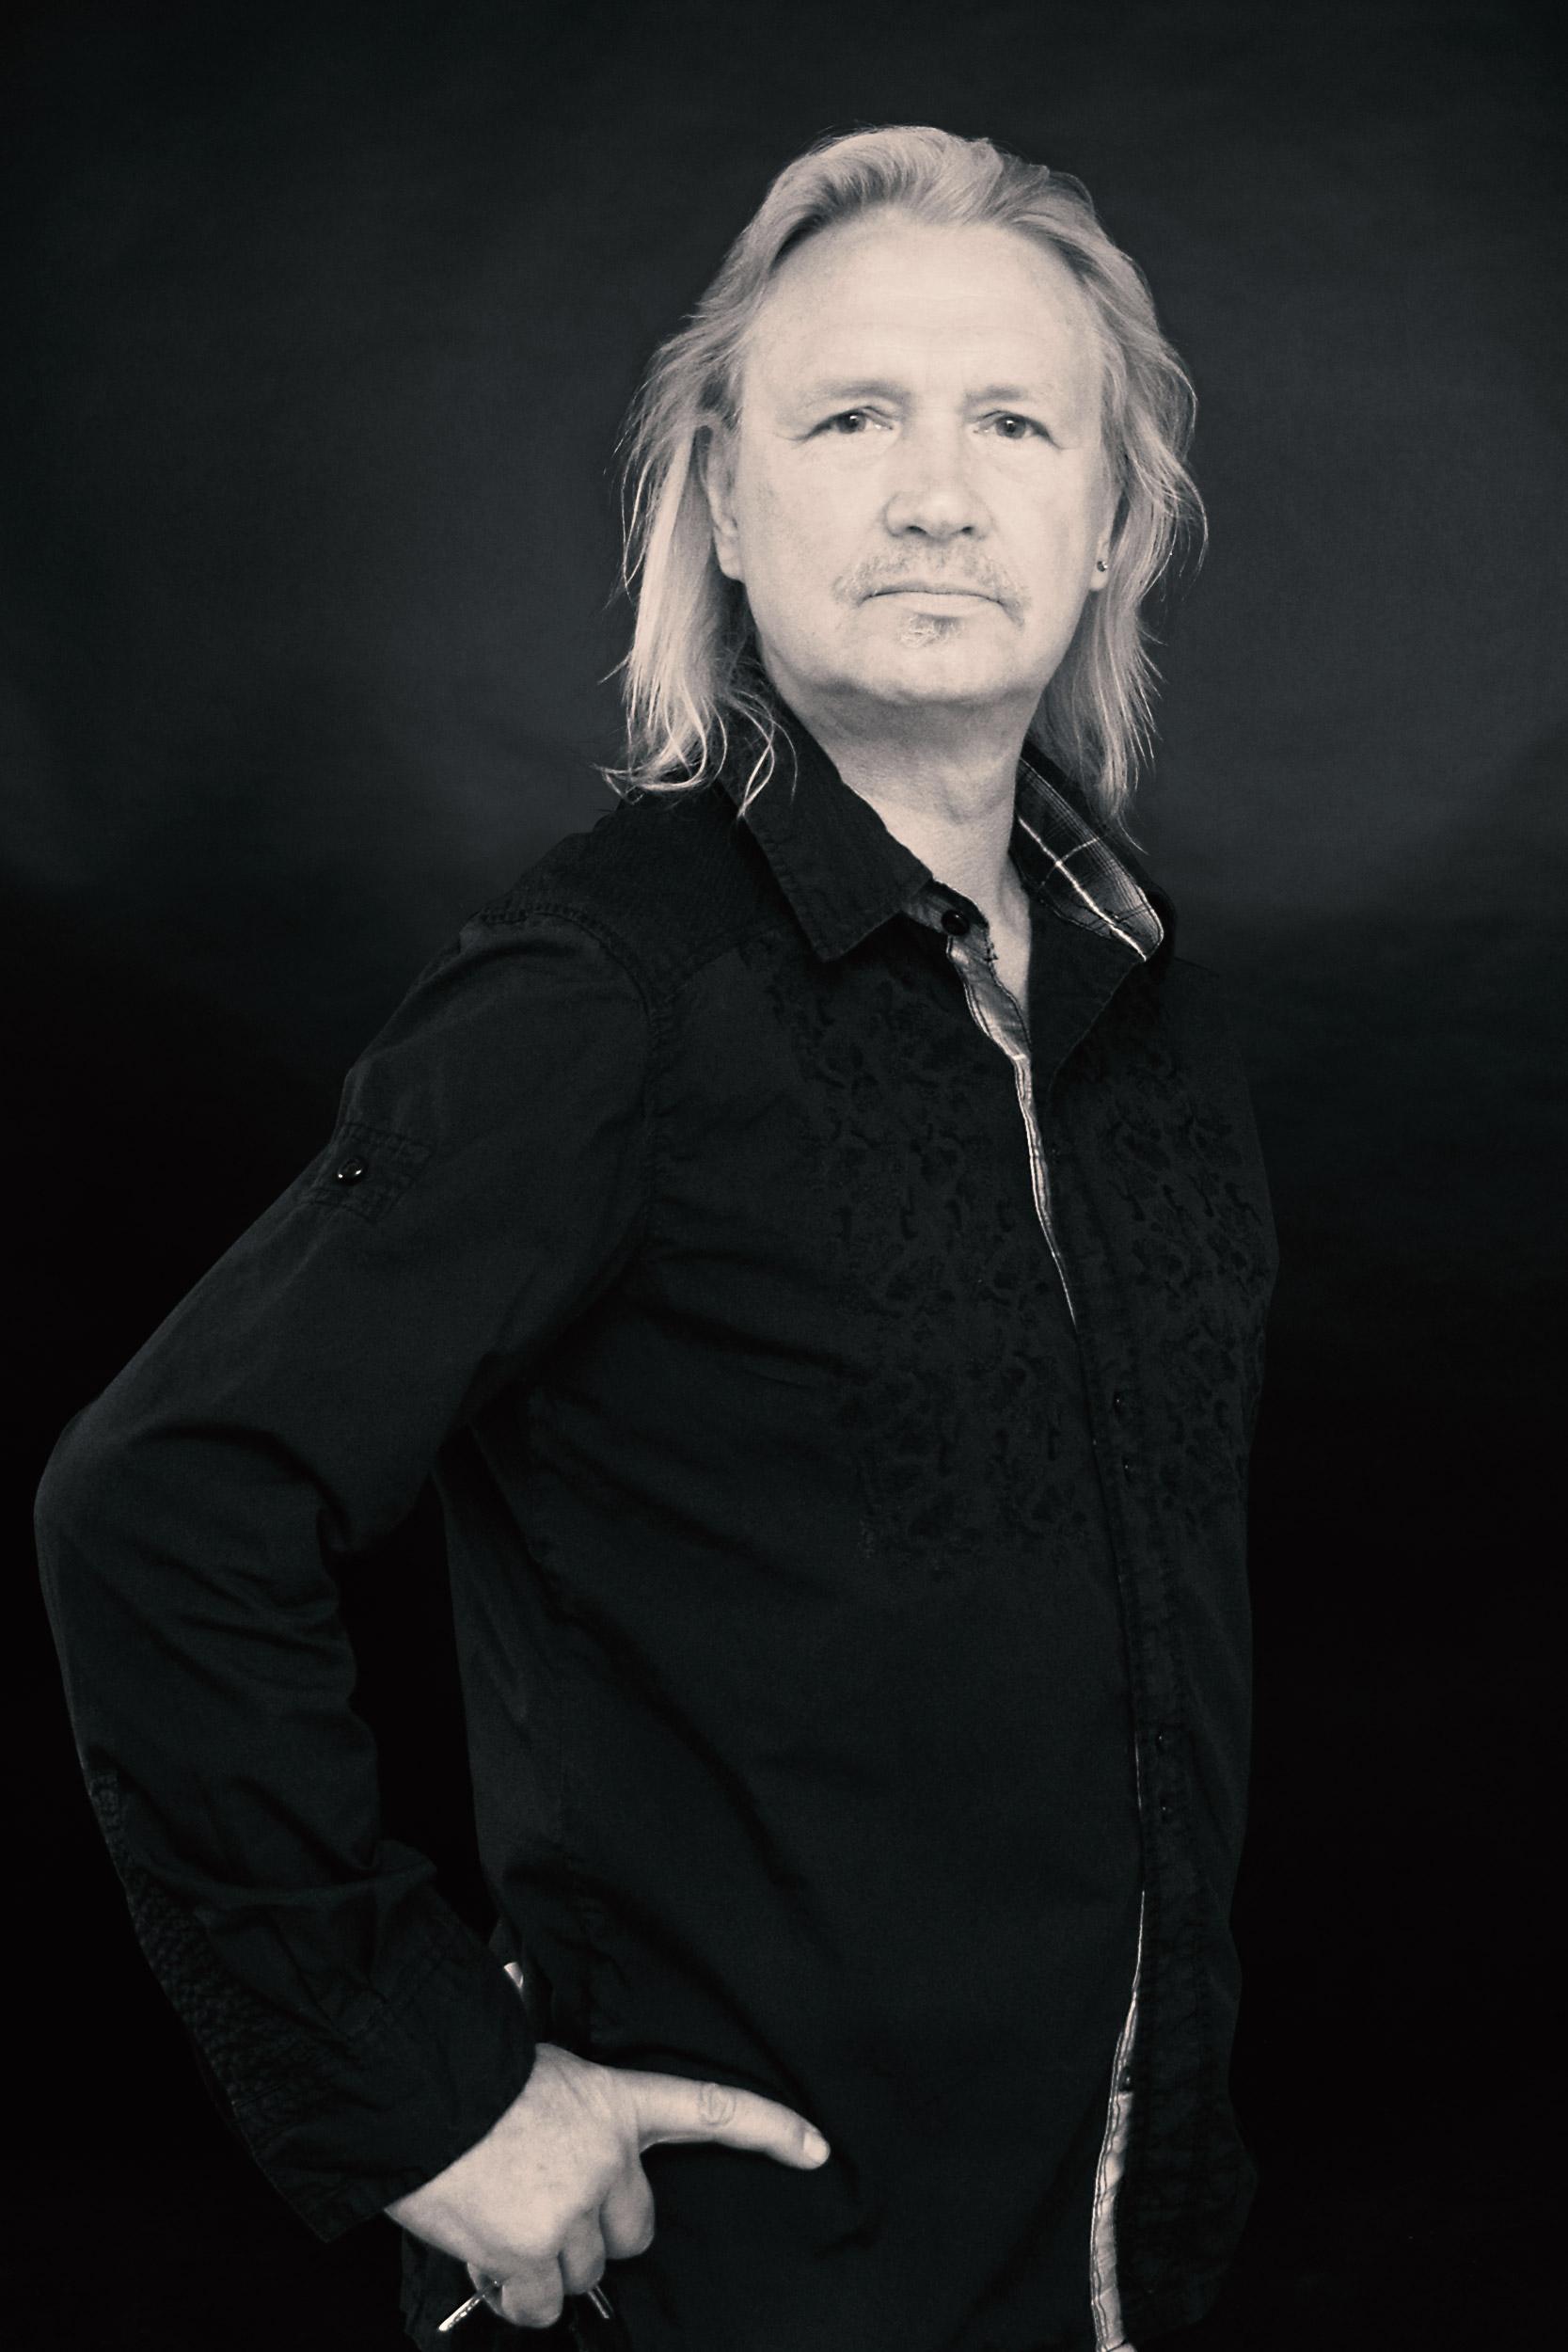 ROCA VERDE - Jörg Kramer